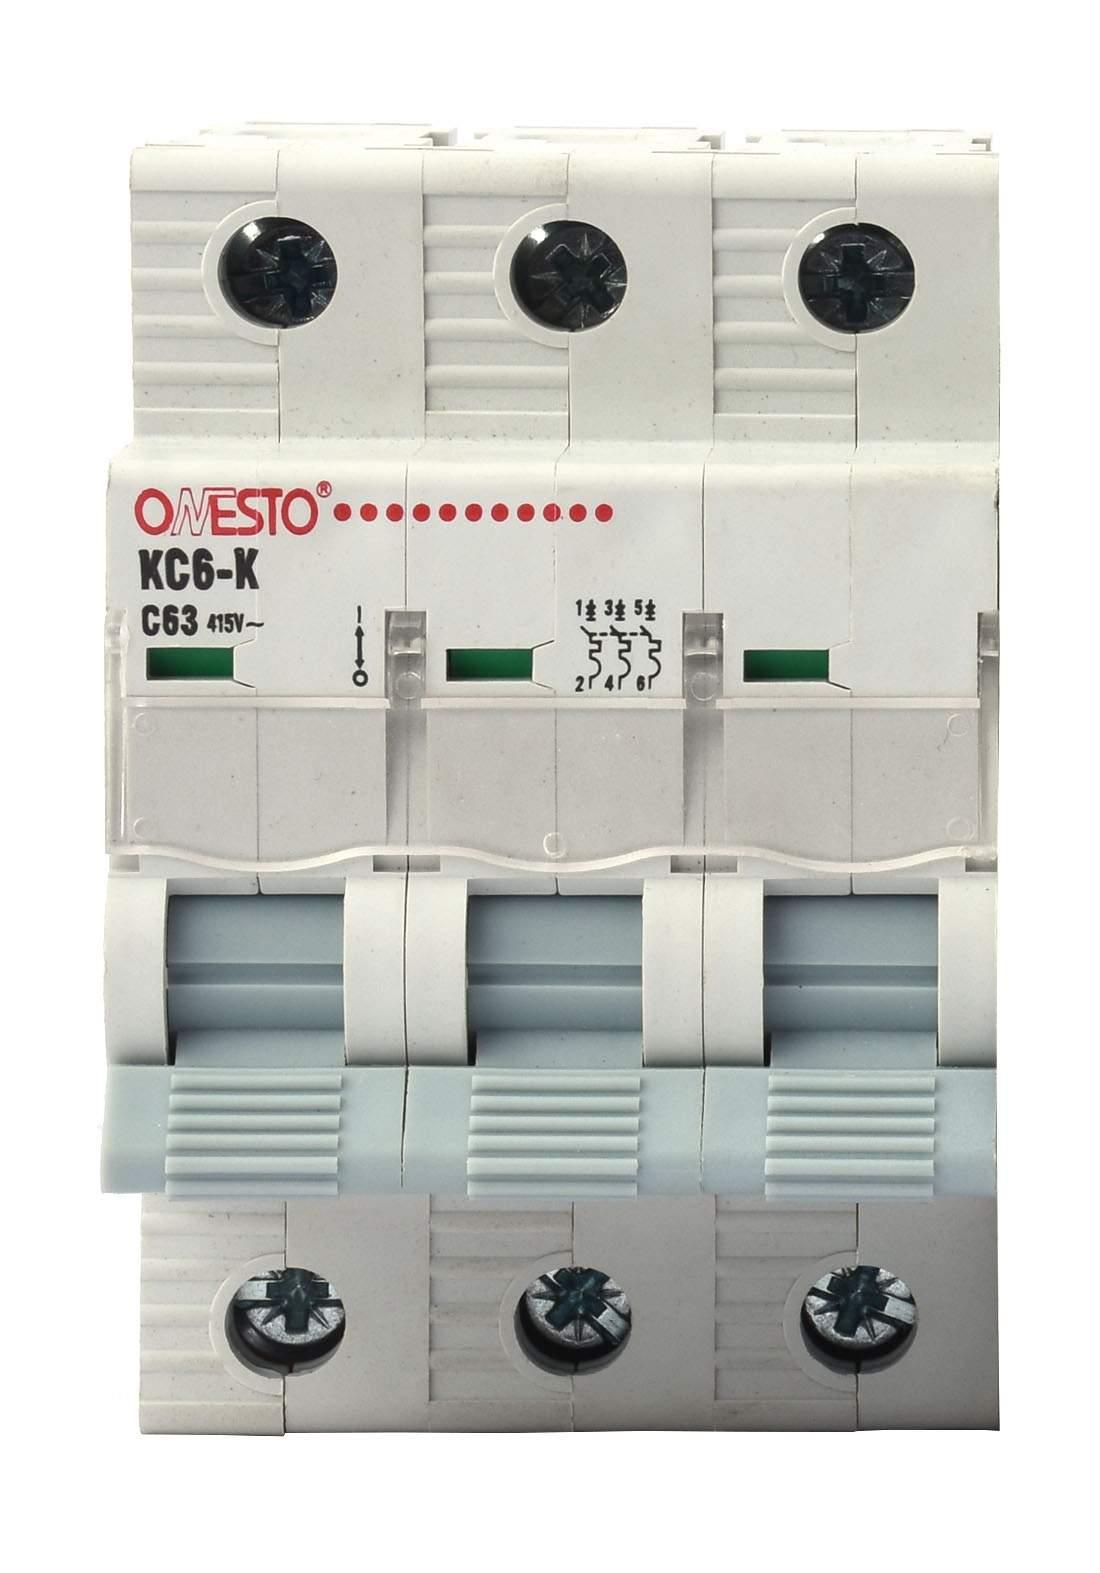 Raja Circuit Breaker 63 A قاطع تيار الكهرباء (جوزة)